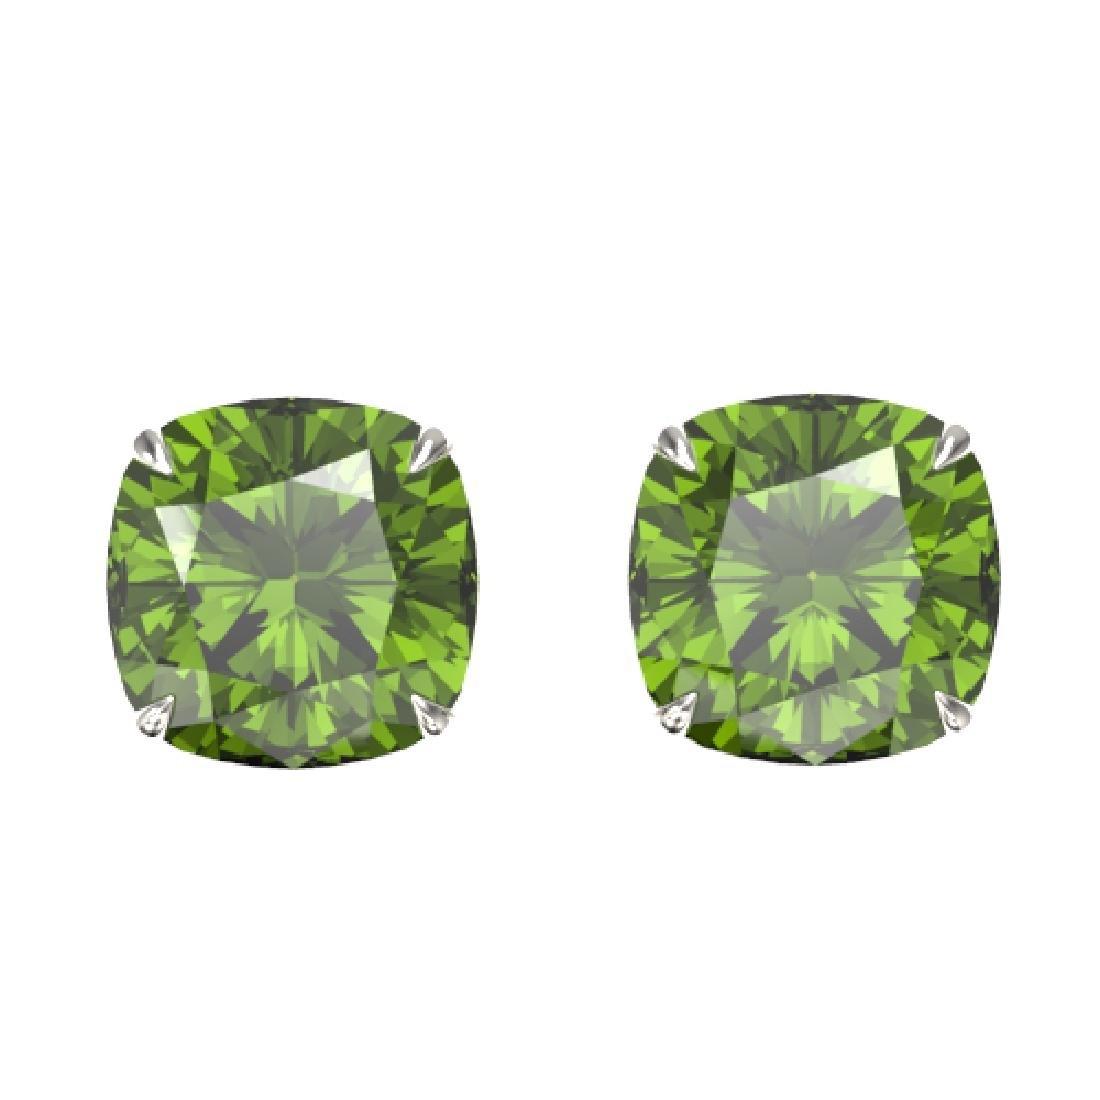 12 CTW Cushion Cut Green Tourmaline Designer Stud